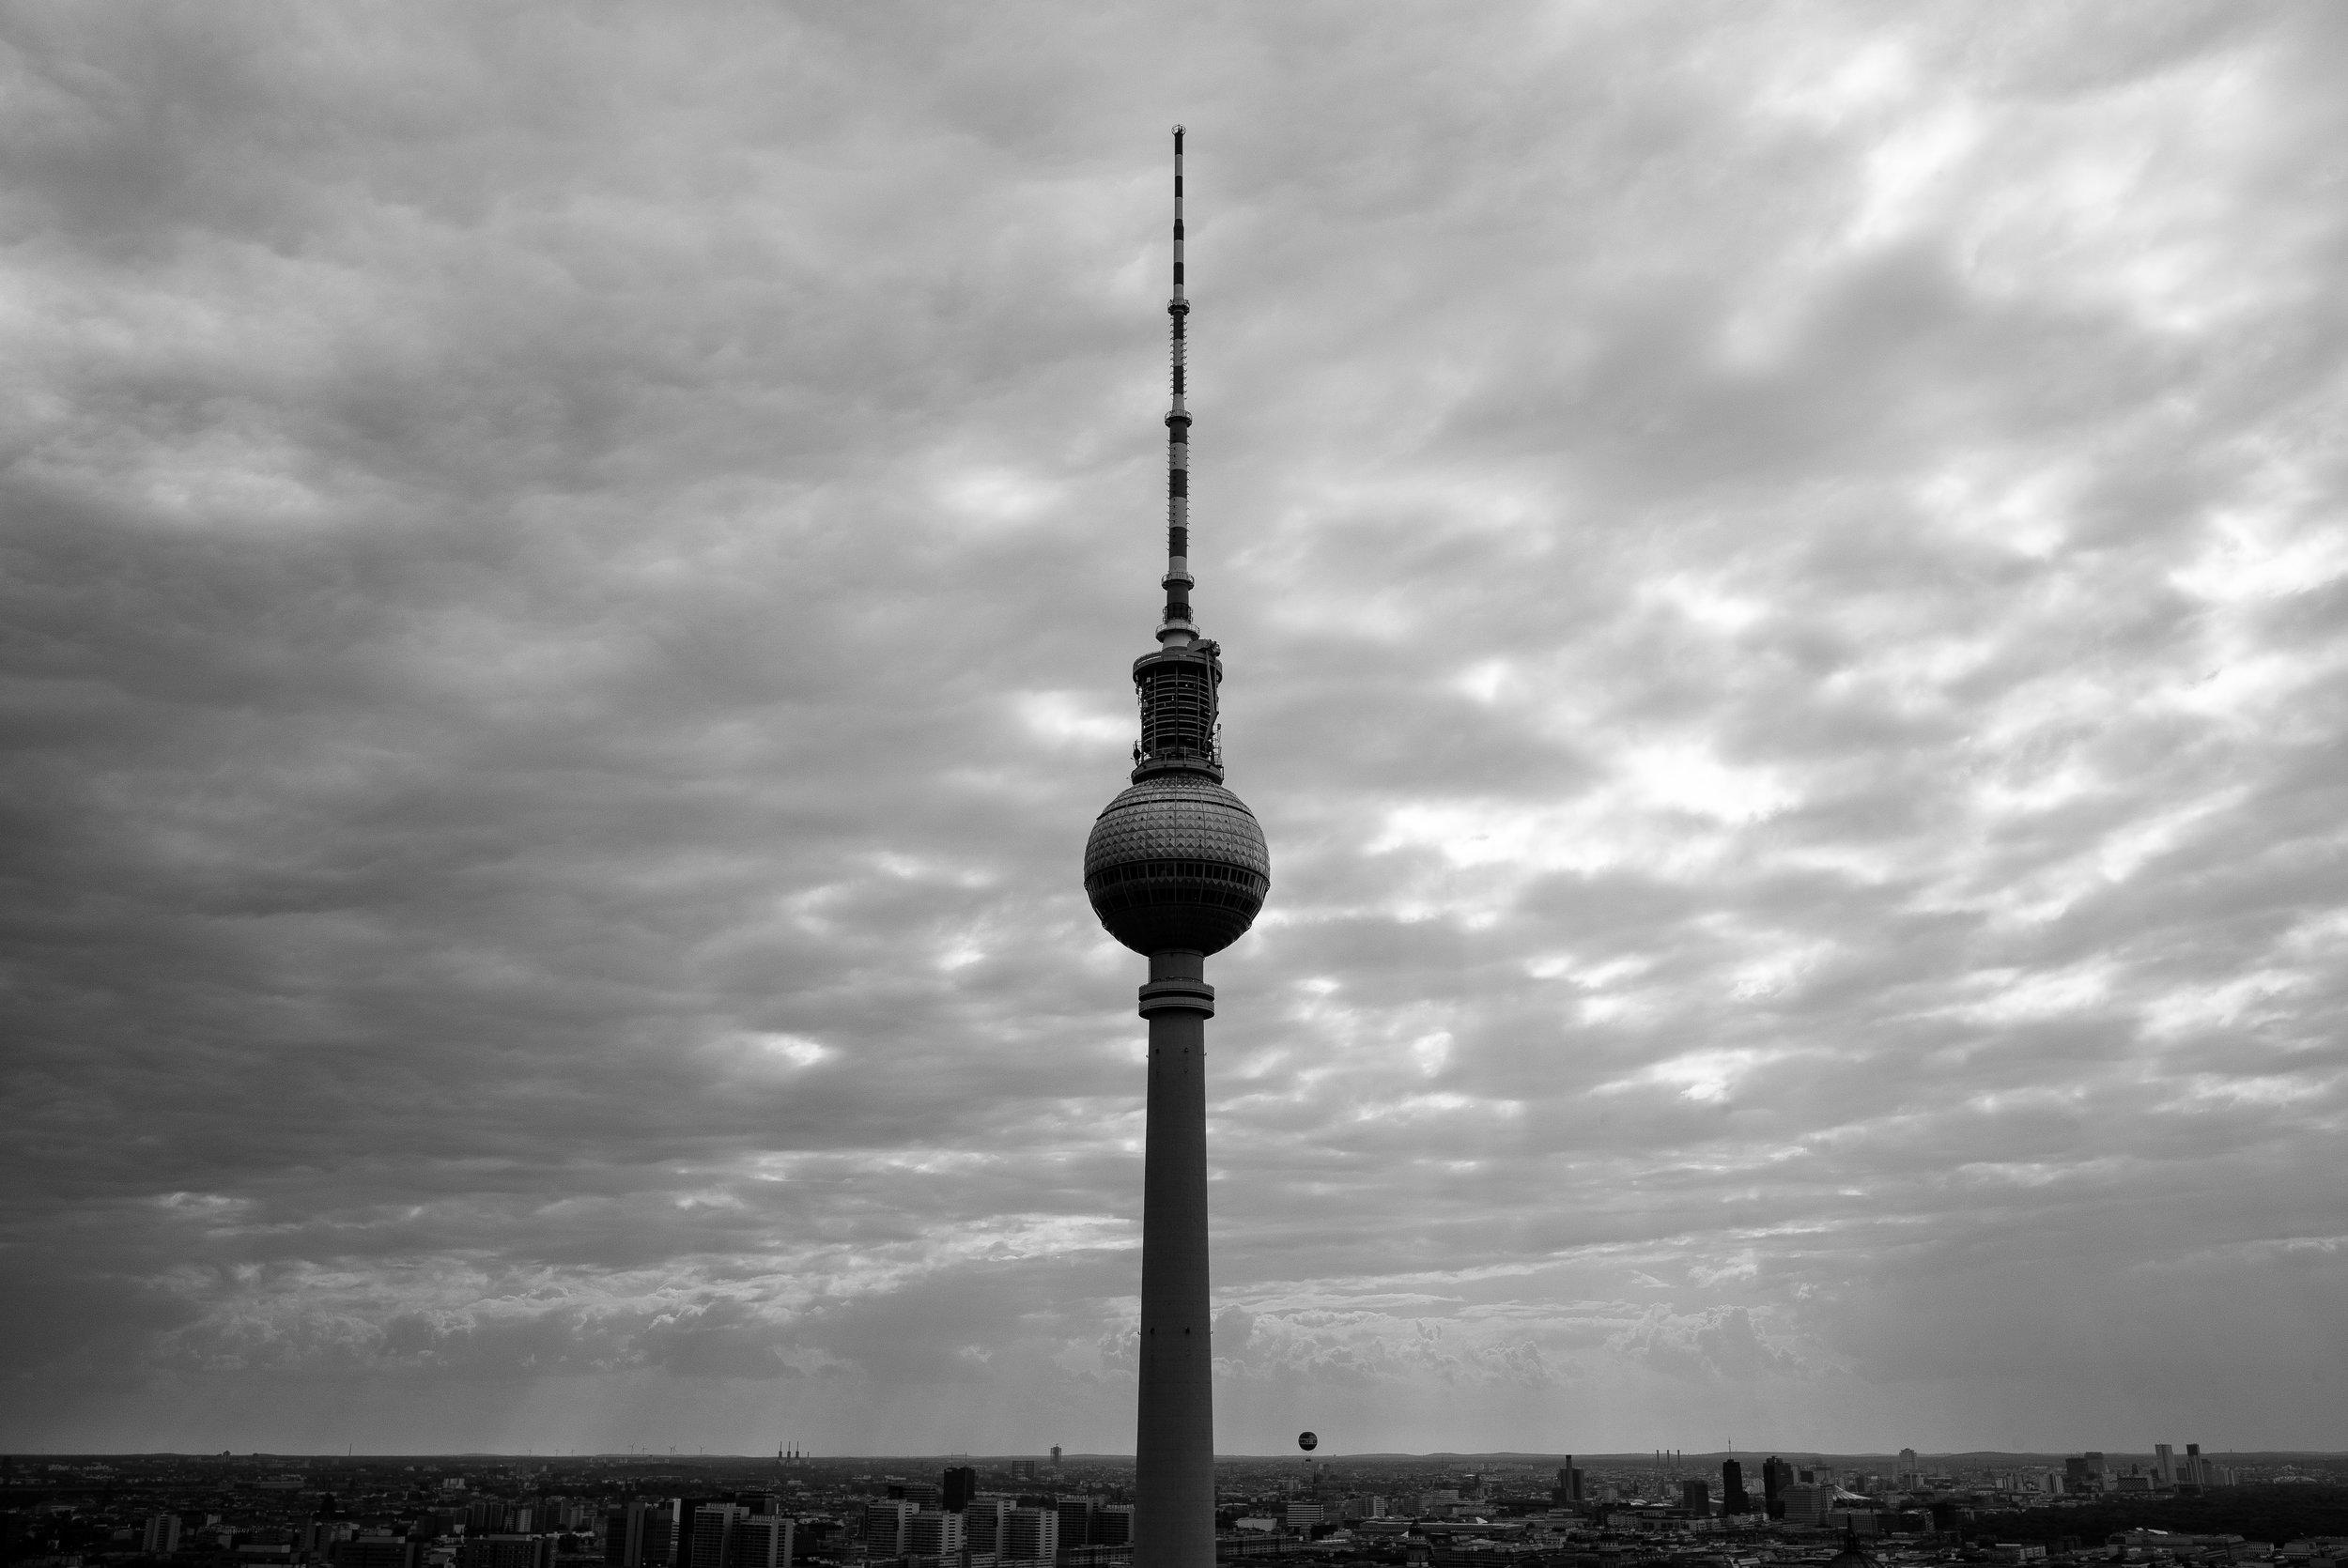 The Fernsehturm, Berlin. Germany. 2019.